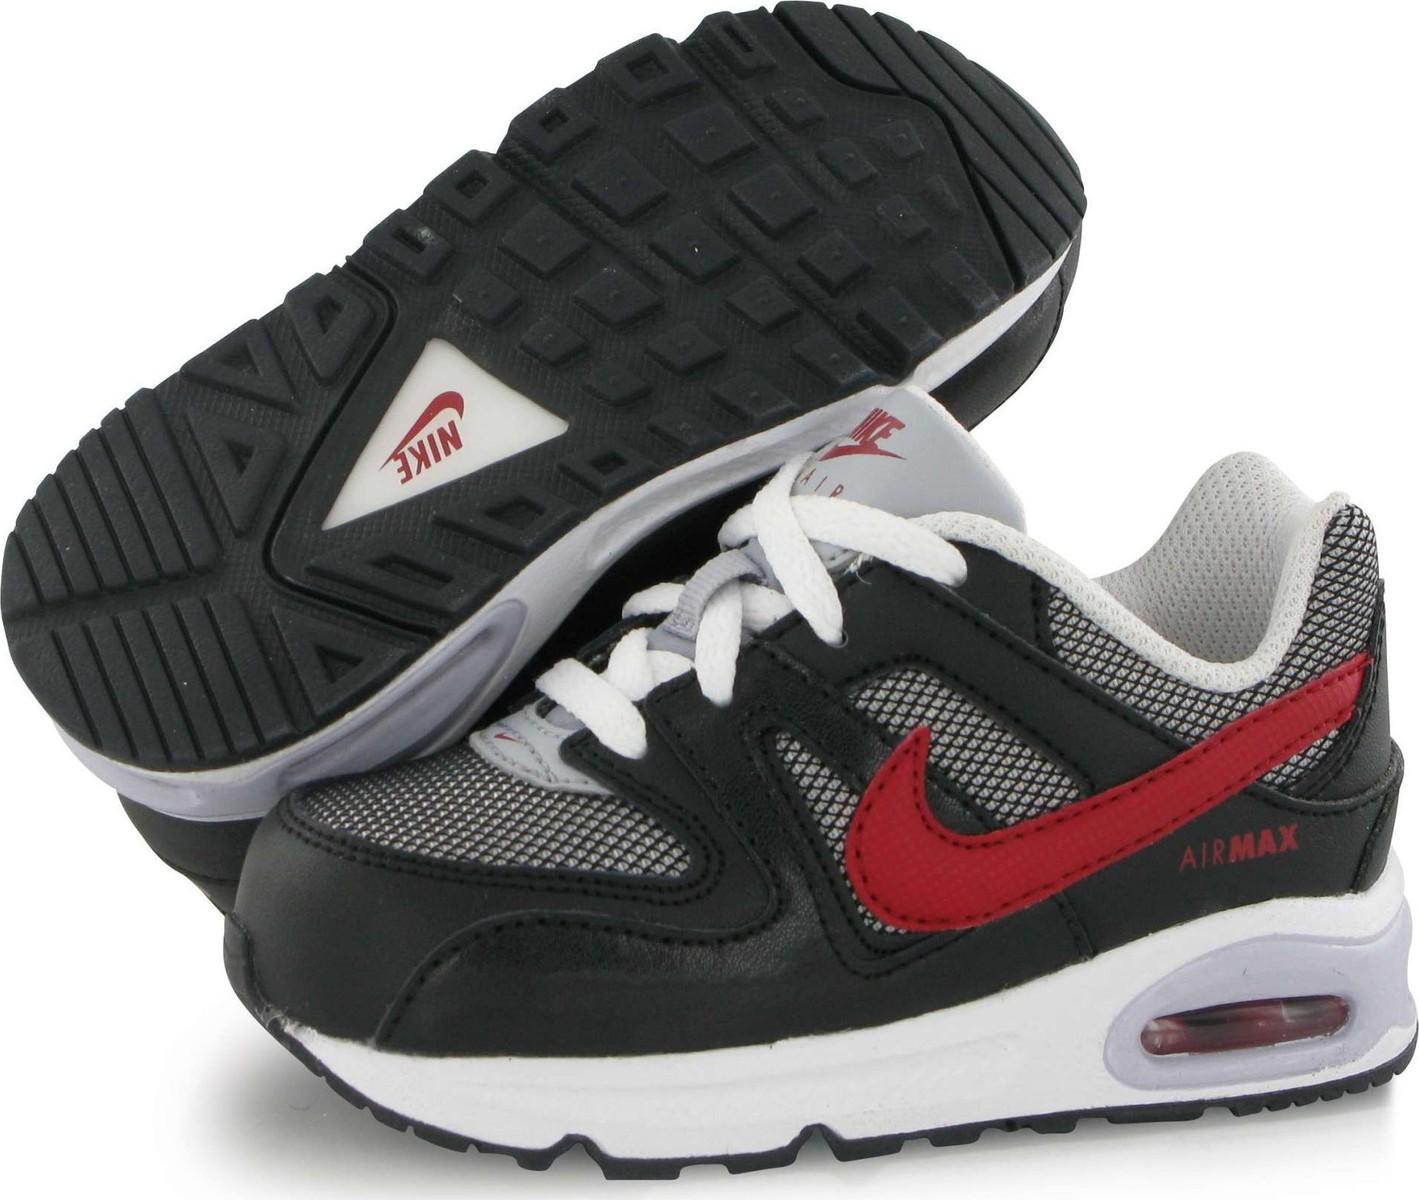 dbfd8c67d6a Nike Air Max Command Td 412229-064 - Skroutz.gr